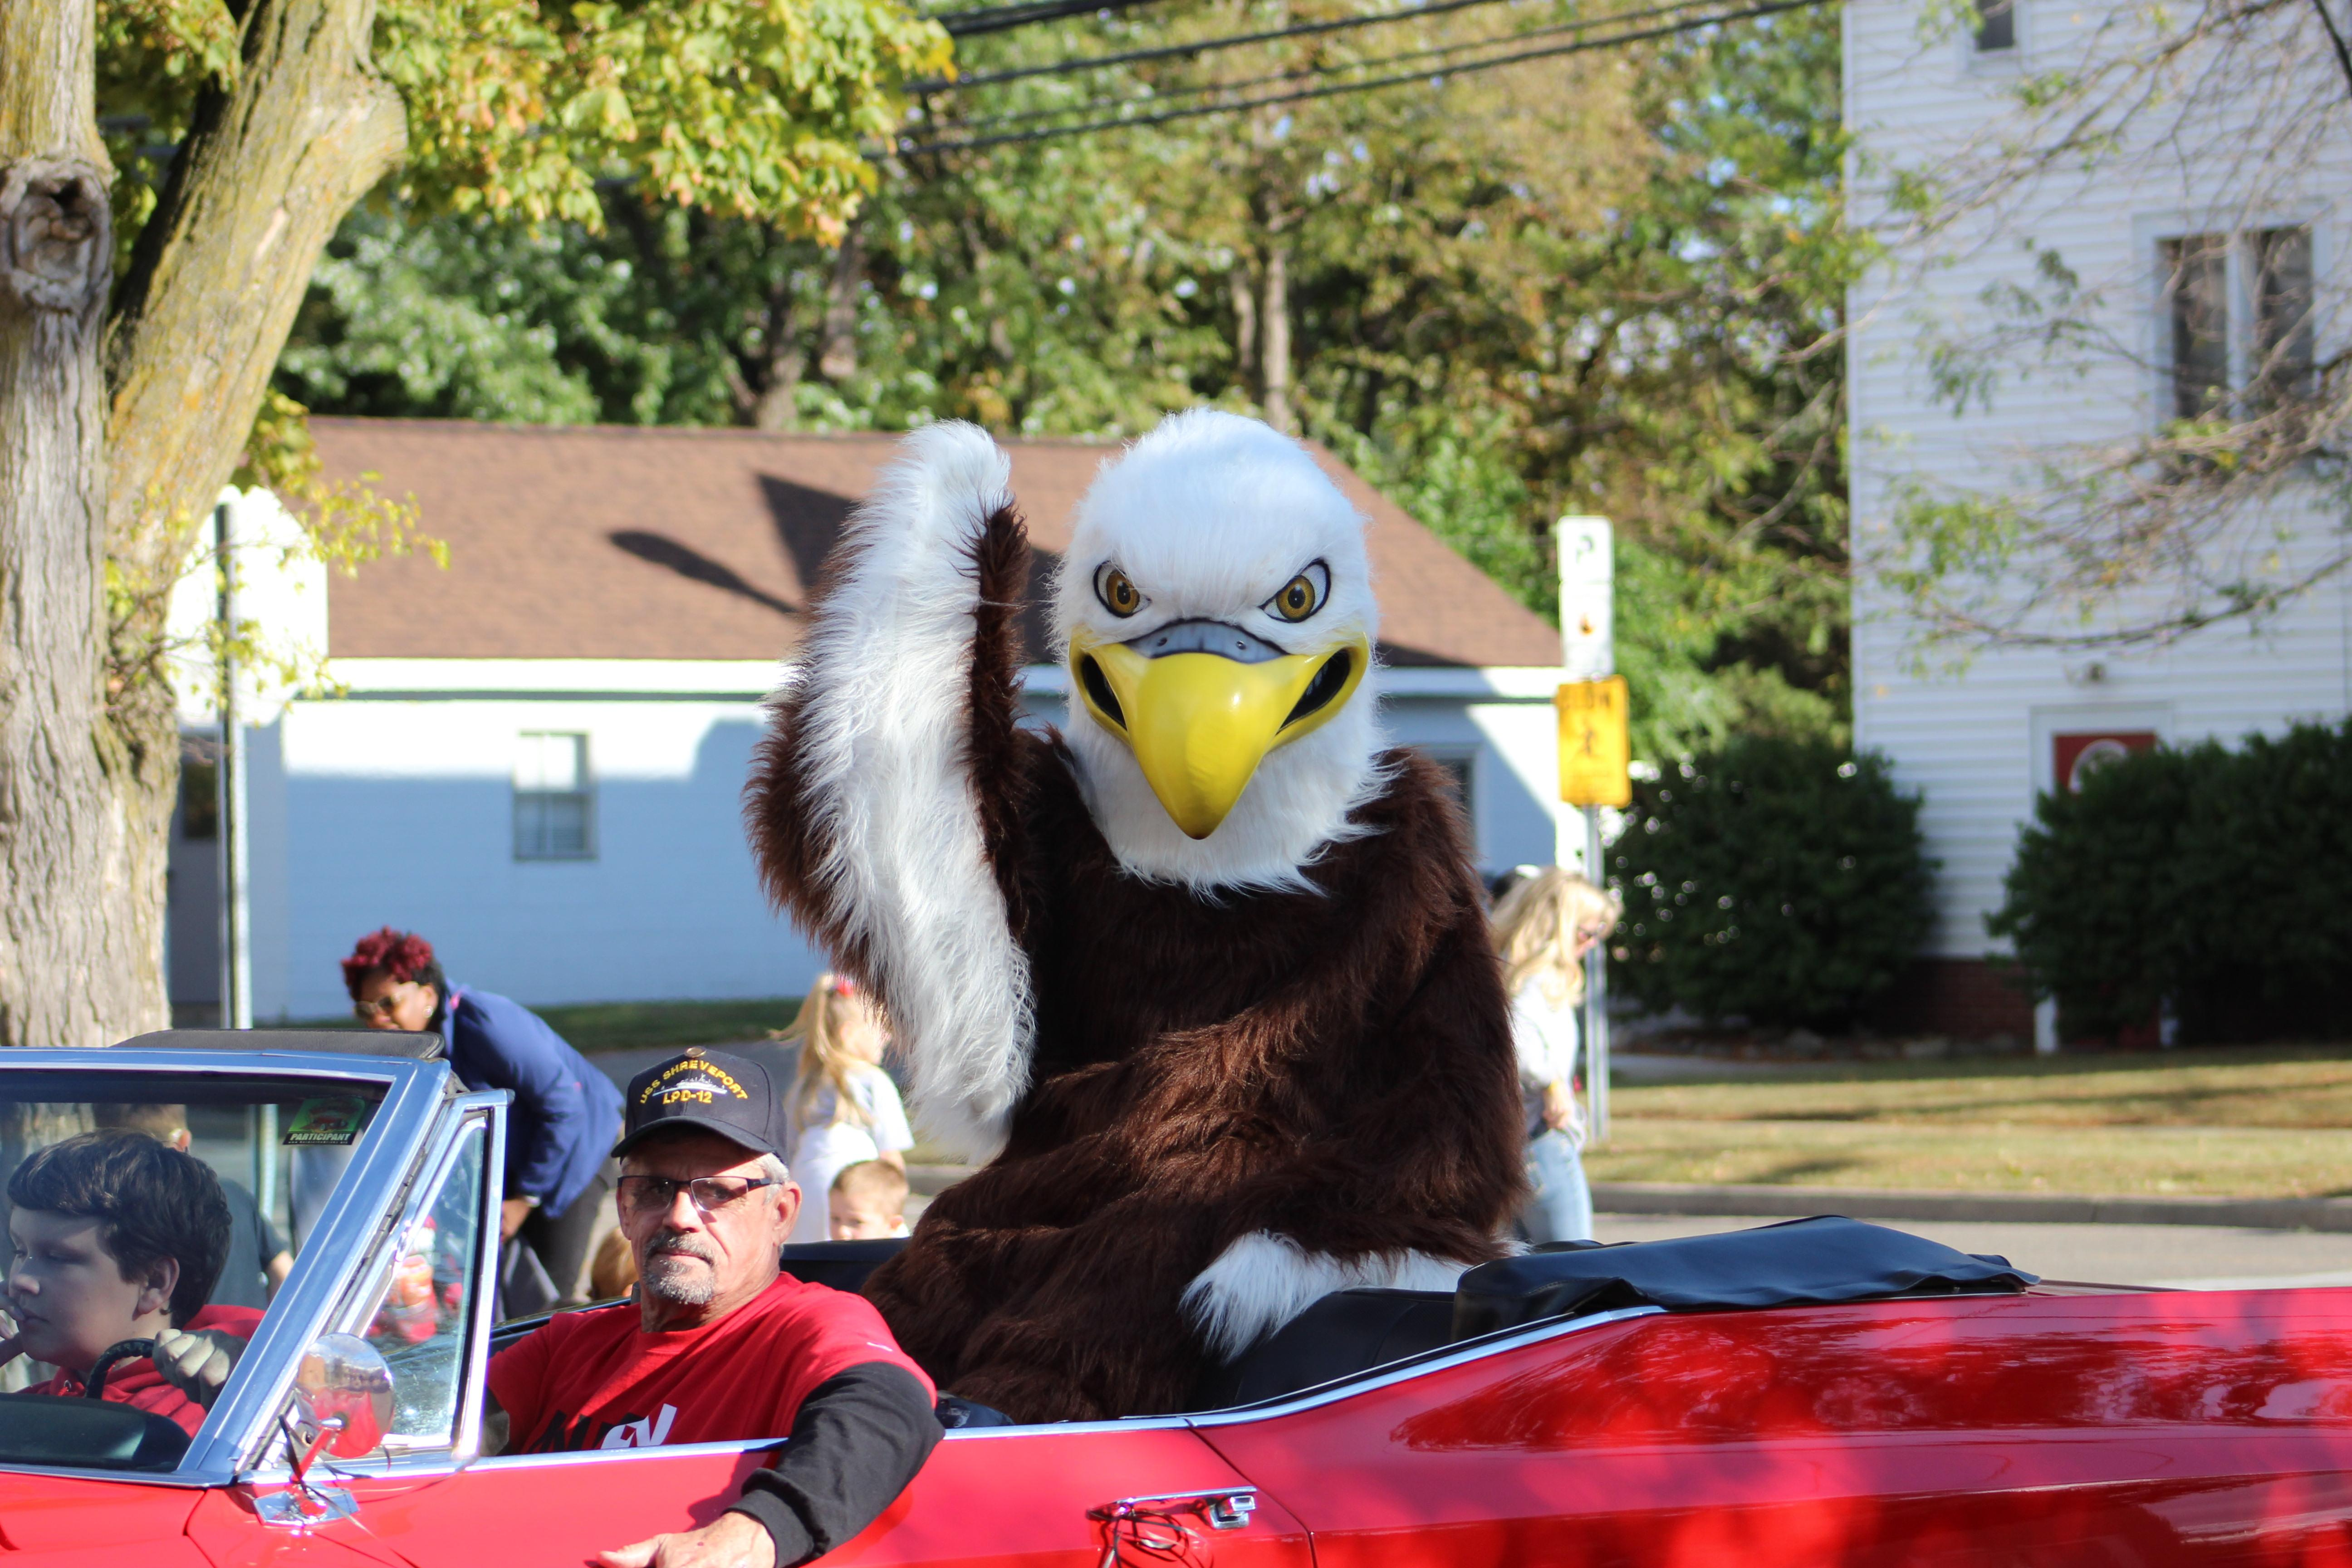 Eagle mascot riding in a convertible car during a parade